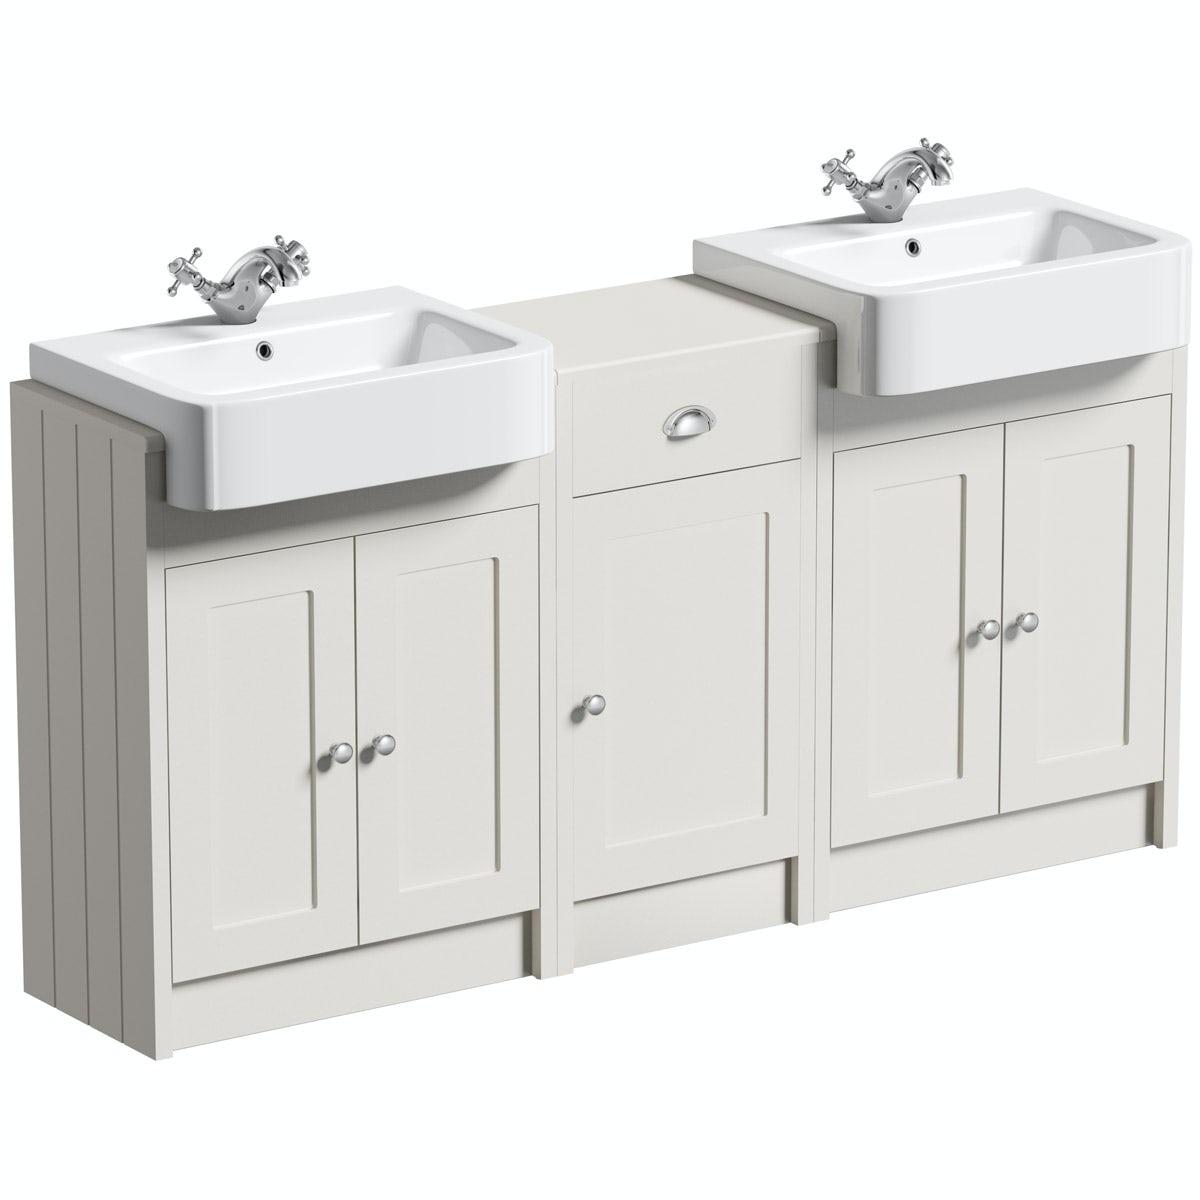 The Bath Co. Dulwich stone ivory double basin & storage combination